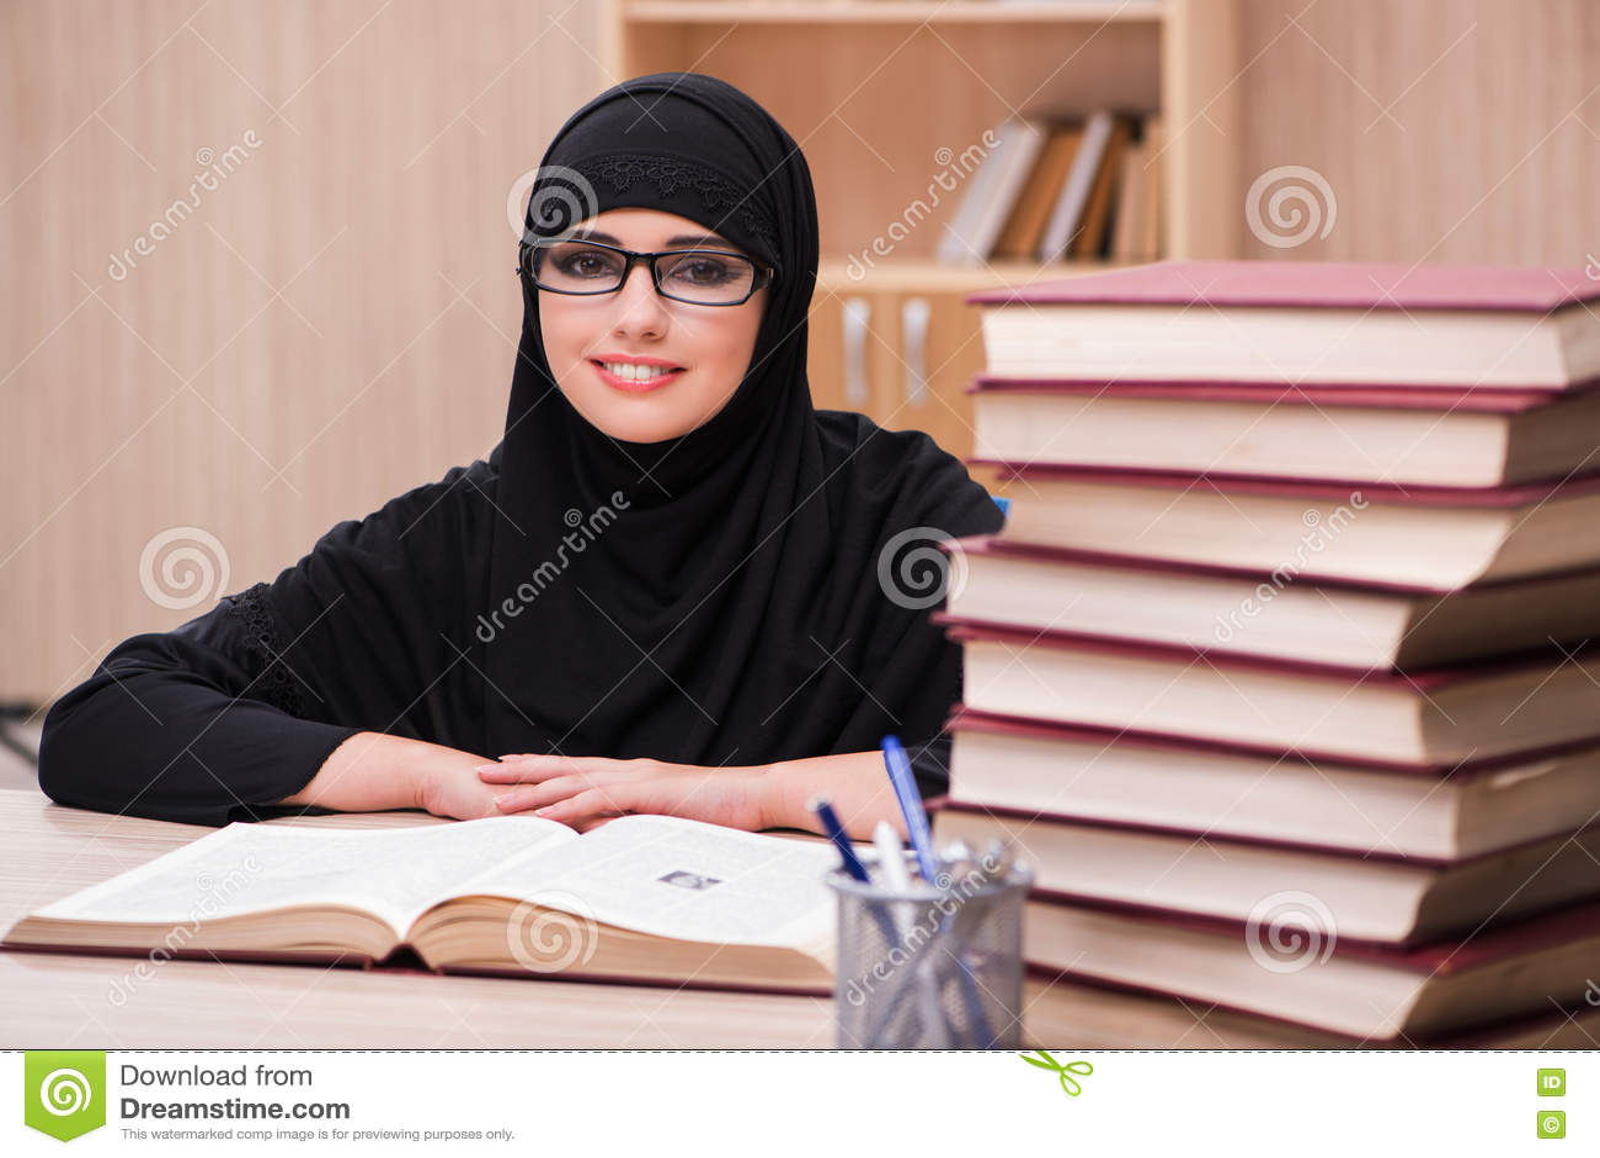 O estudante muçulmano da mulher que prepara-se para exames